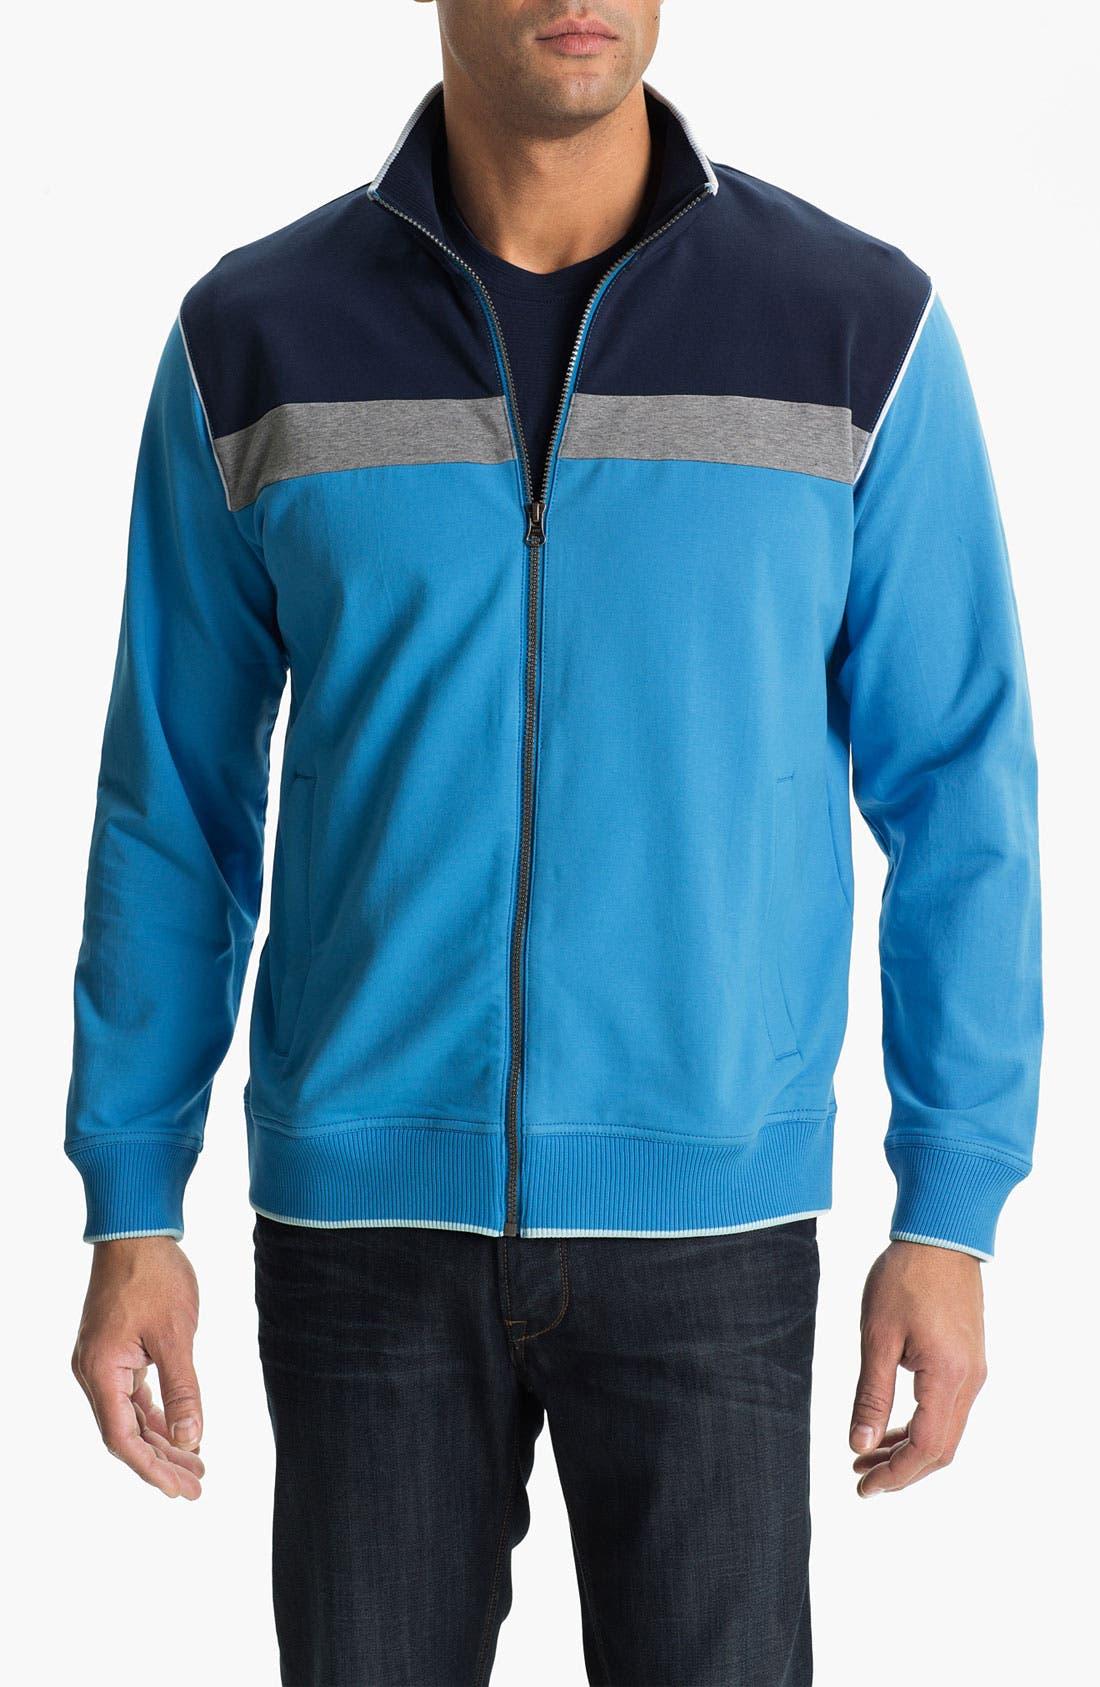 Main Image - Cutter & Buck 'Broadmoor' Full Zip Jacket